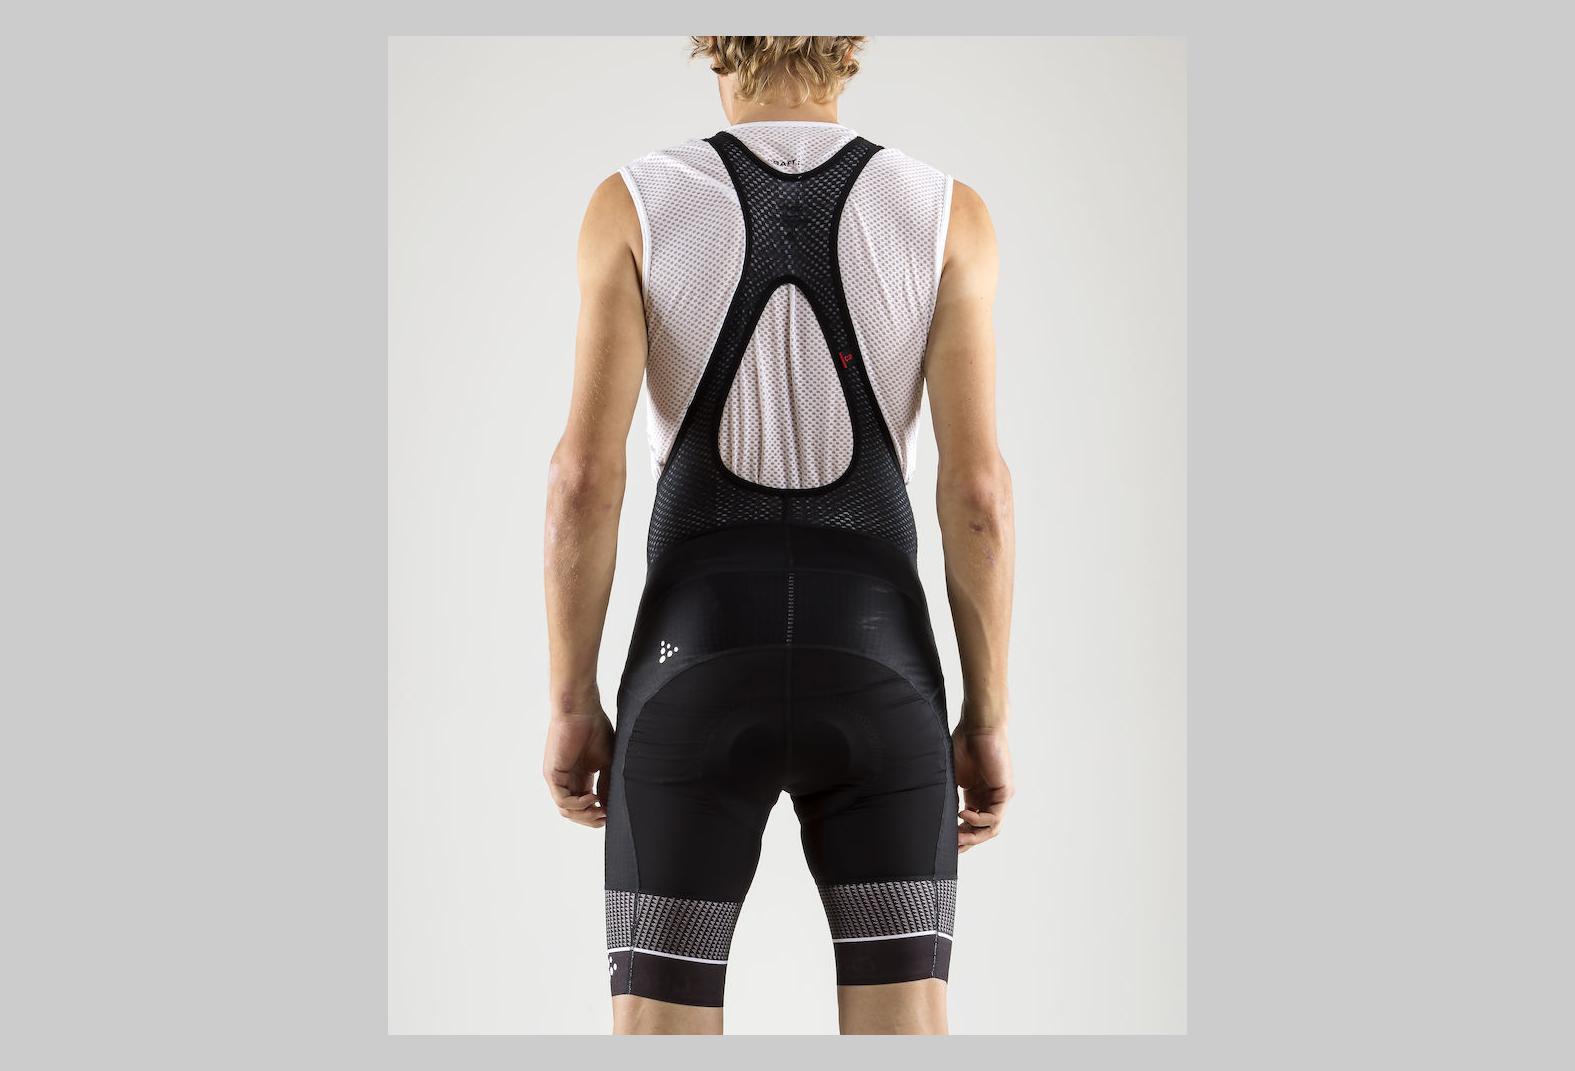 MAVIC cycling Arm Warmers-Noir//Noir RRP £ 27.99